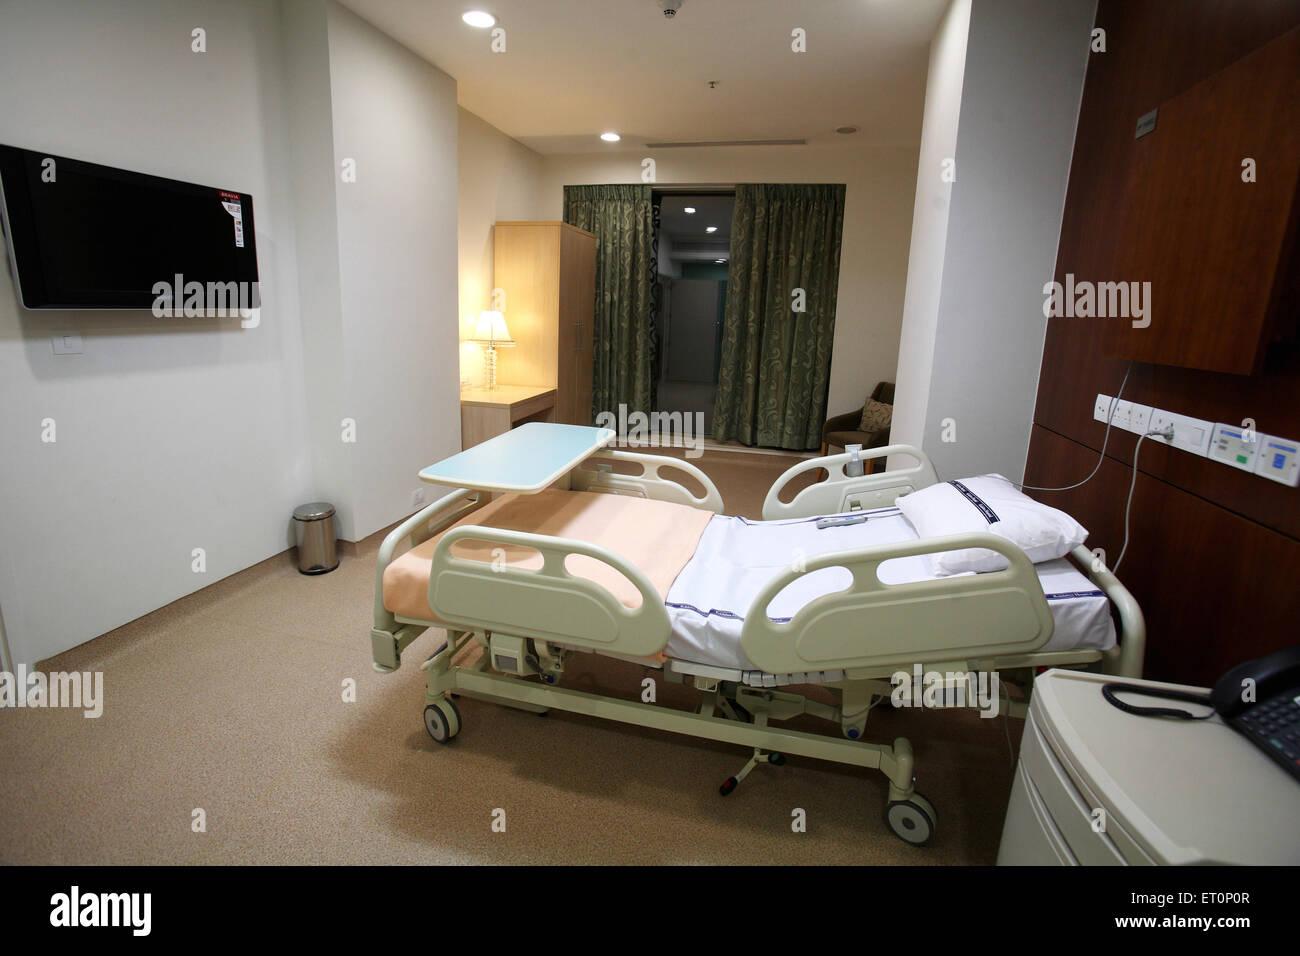 ambani home interior the most expensive house in the world ambani stock photos ambani home interiors